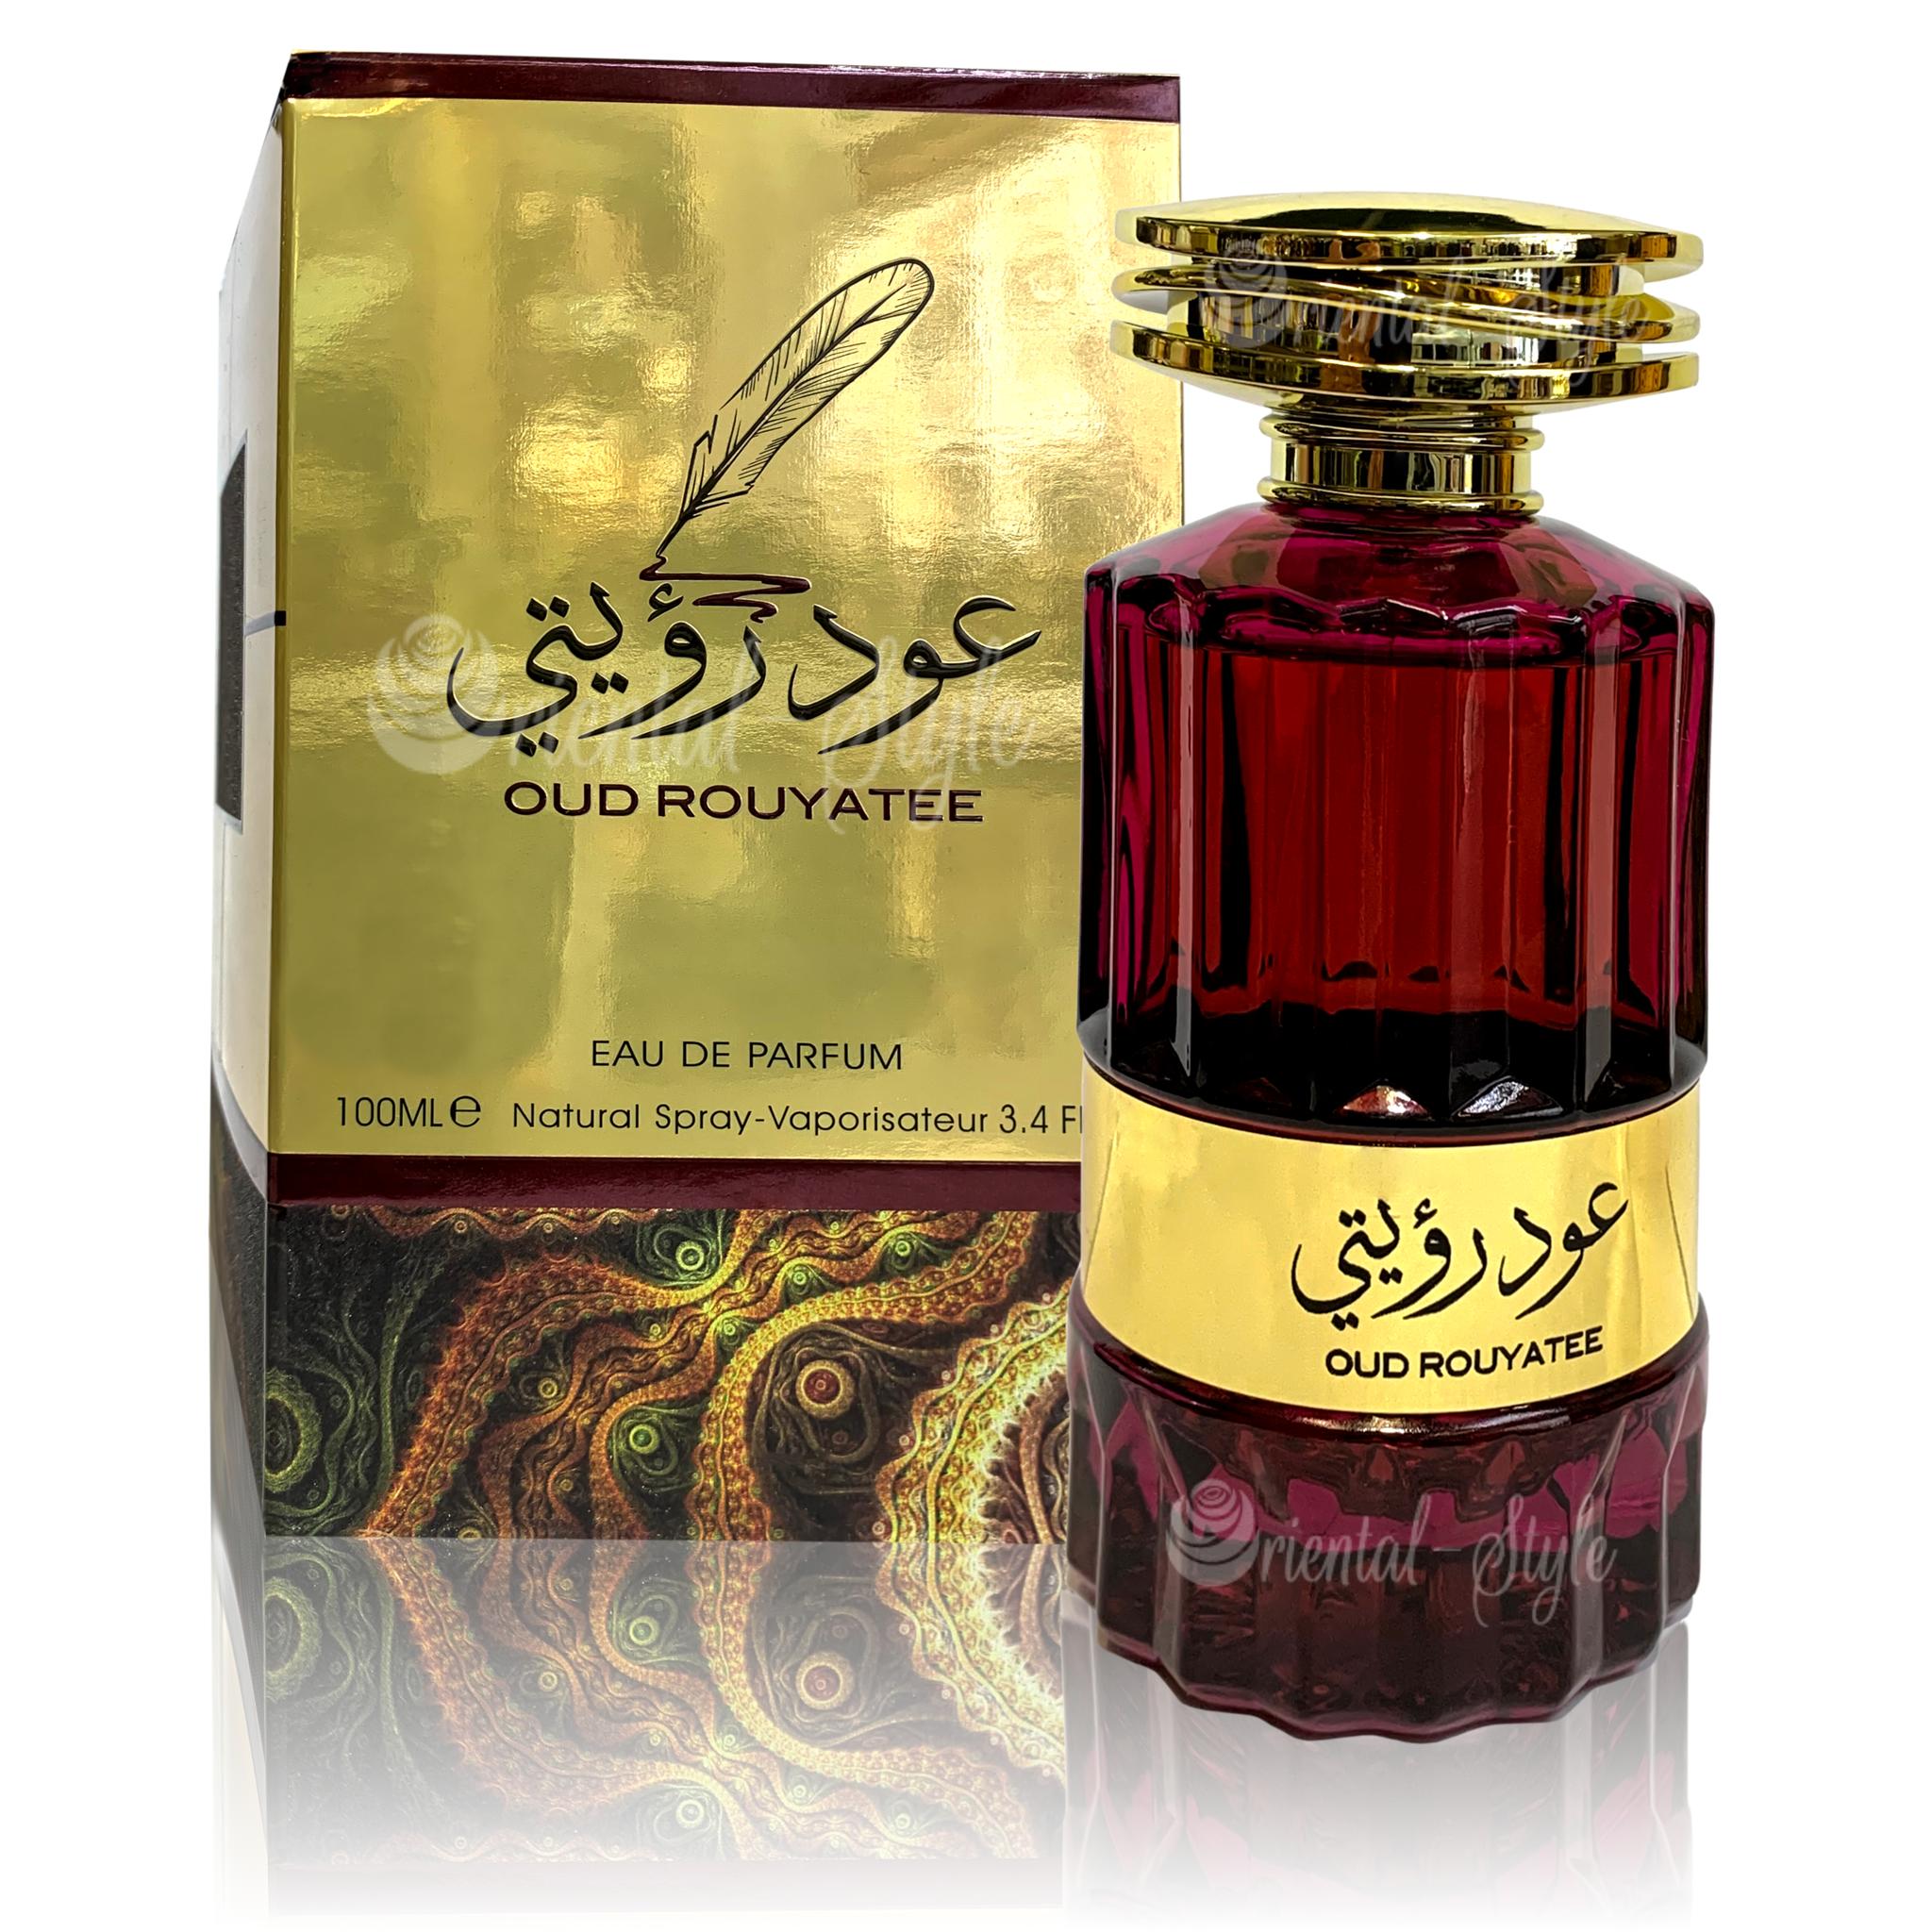 Ard Al Zaafaran Oud Rouyatee Eau de Parfum Perfume